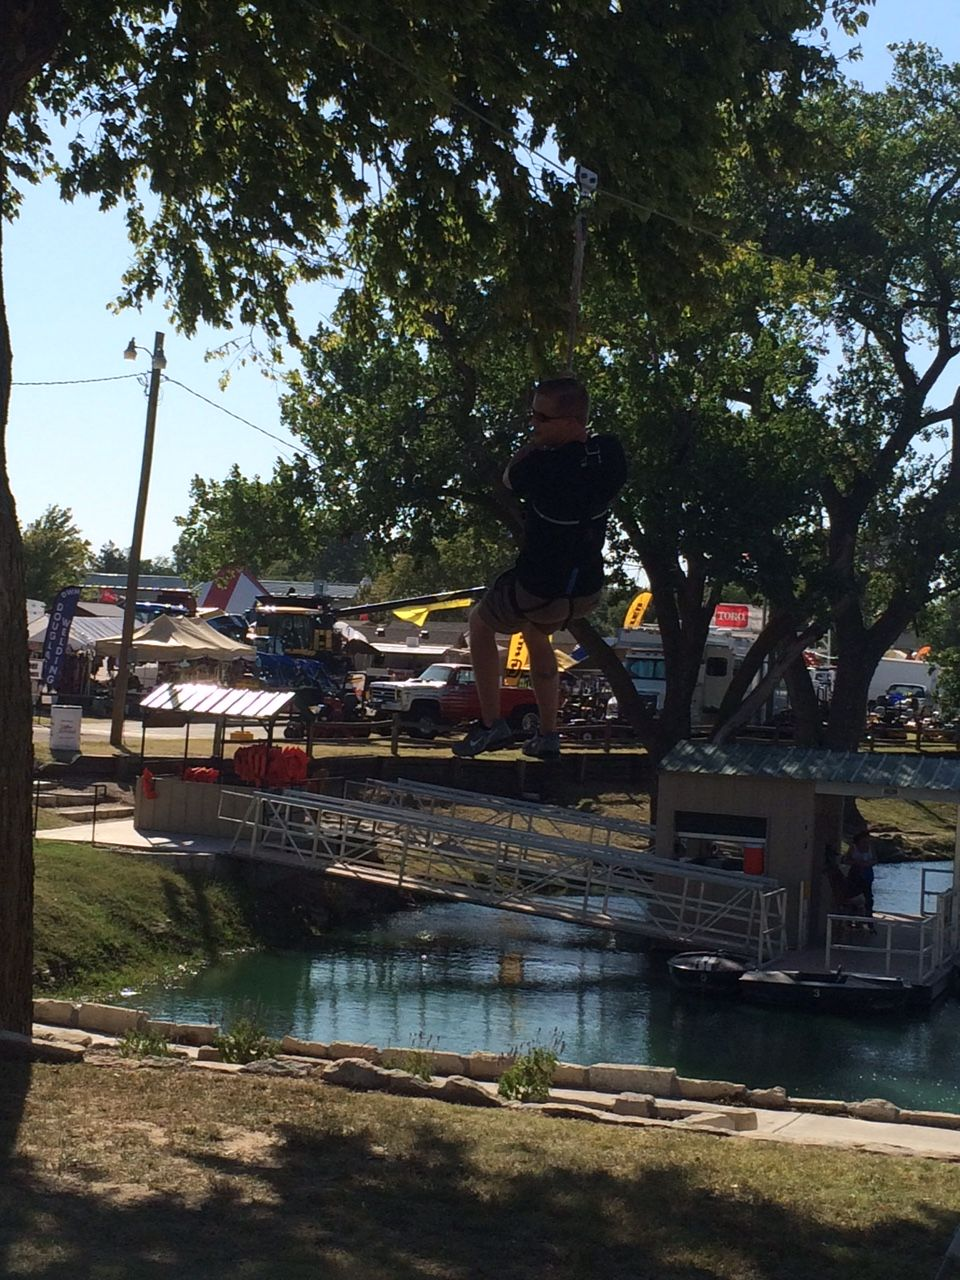 zipline (With images) Kansas state, Ziplining